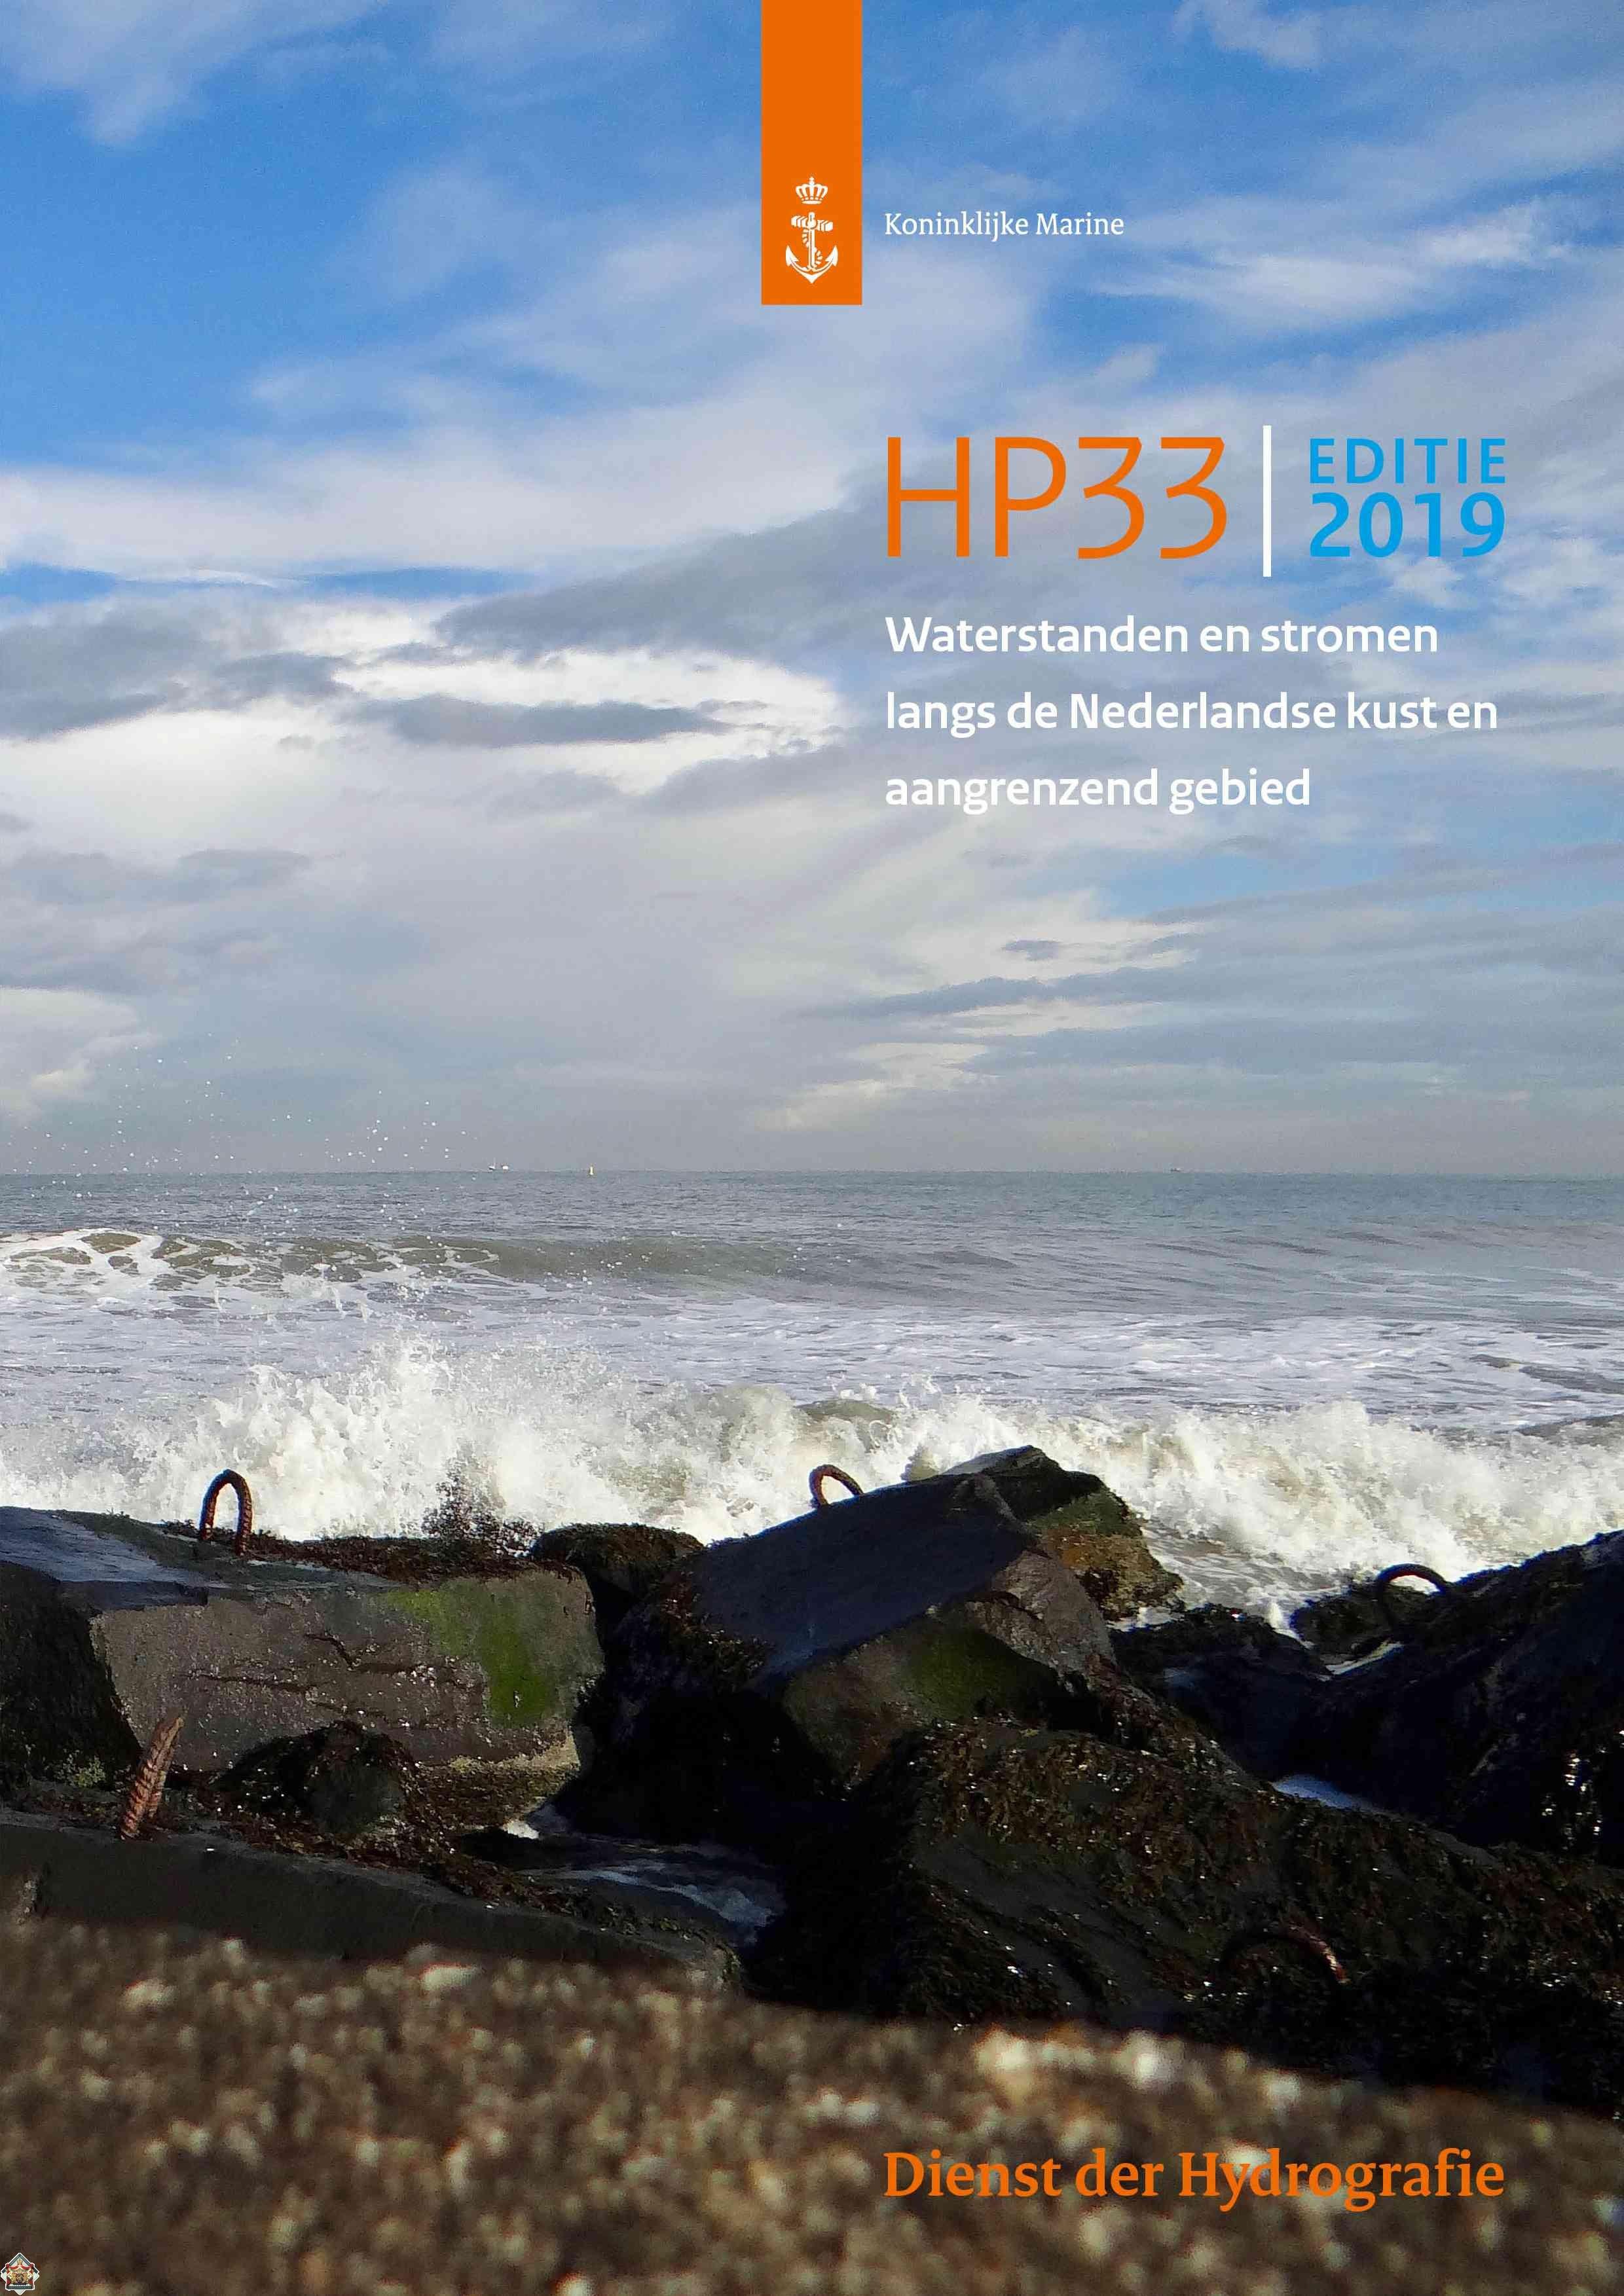 https://www.stentec.com/shop/images/nl-tides.jpg